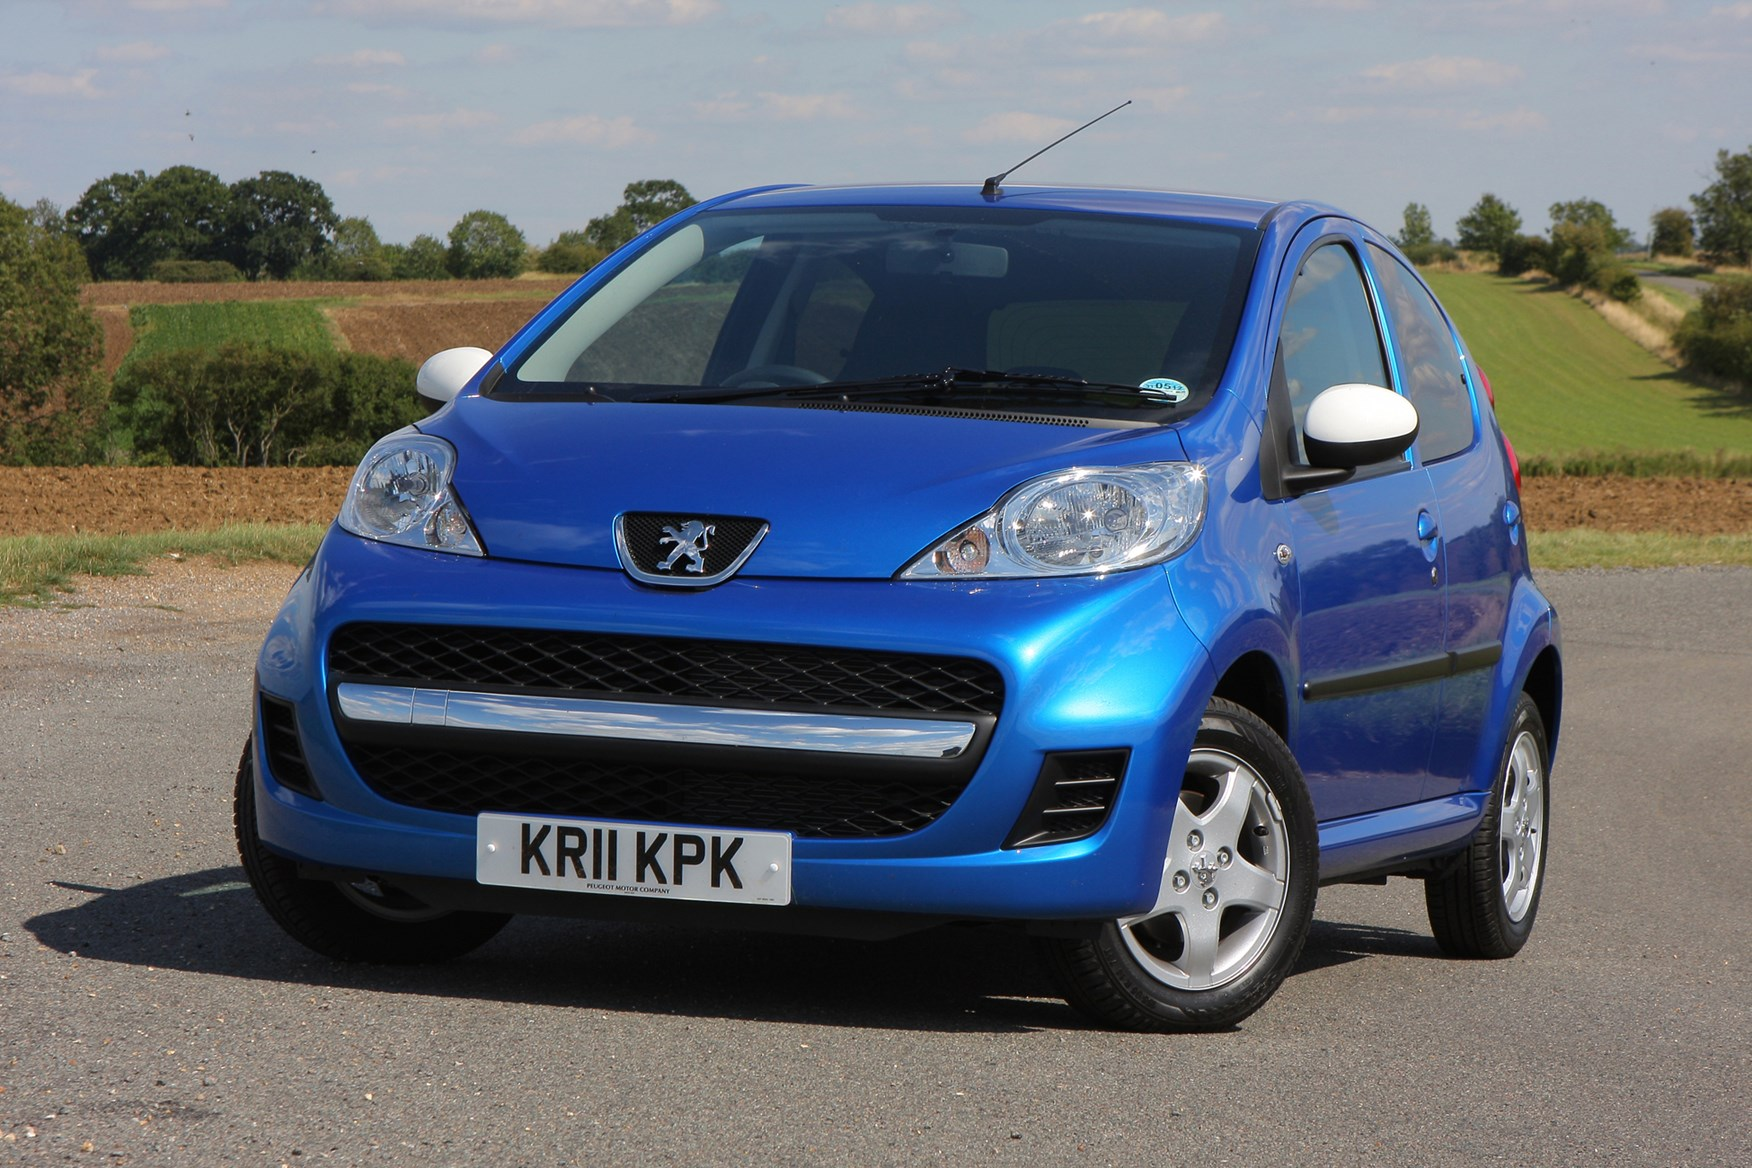 Buying Used Car Uk Tax